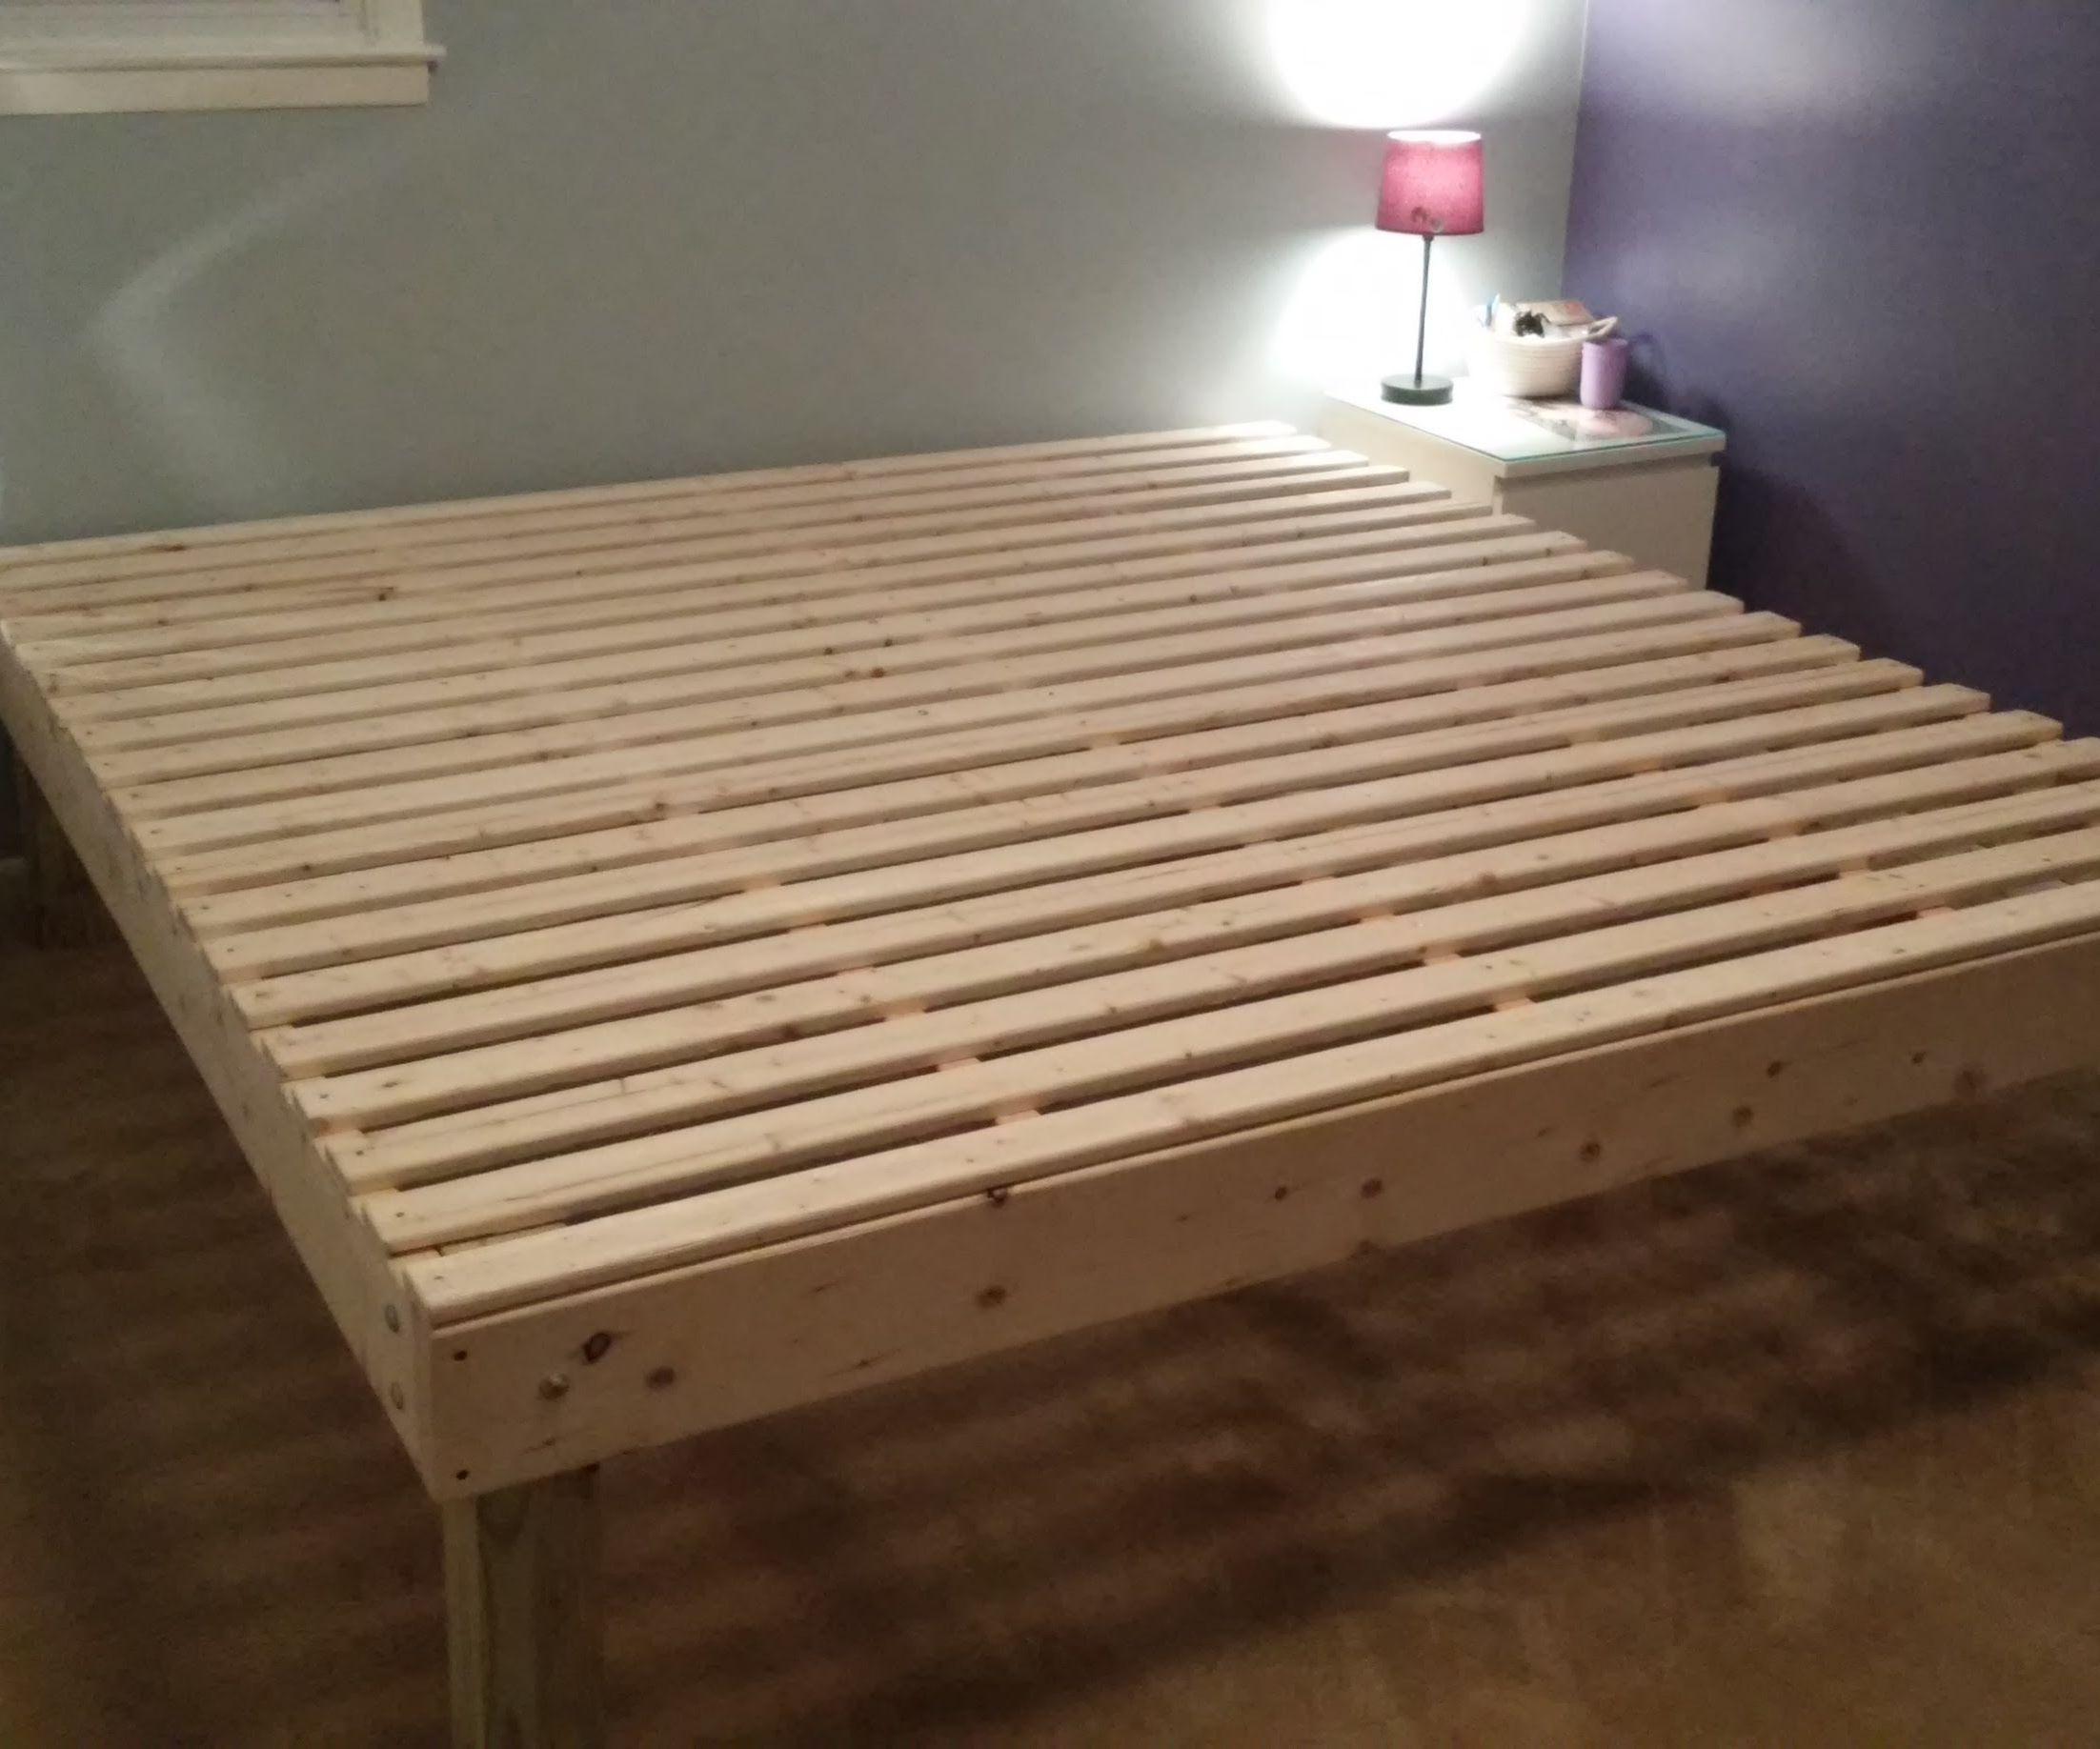 Foam Mattress Bed Frame for under $100